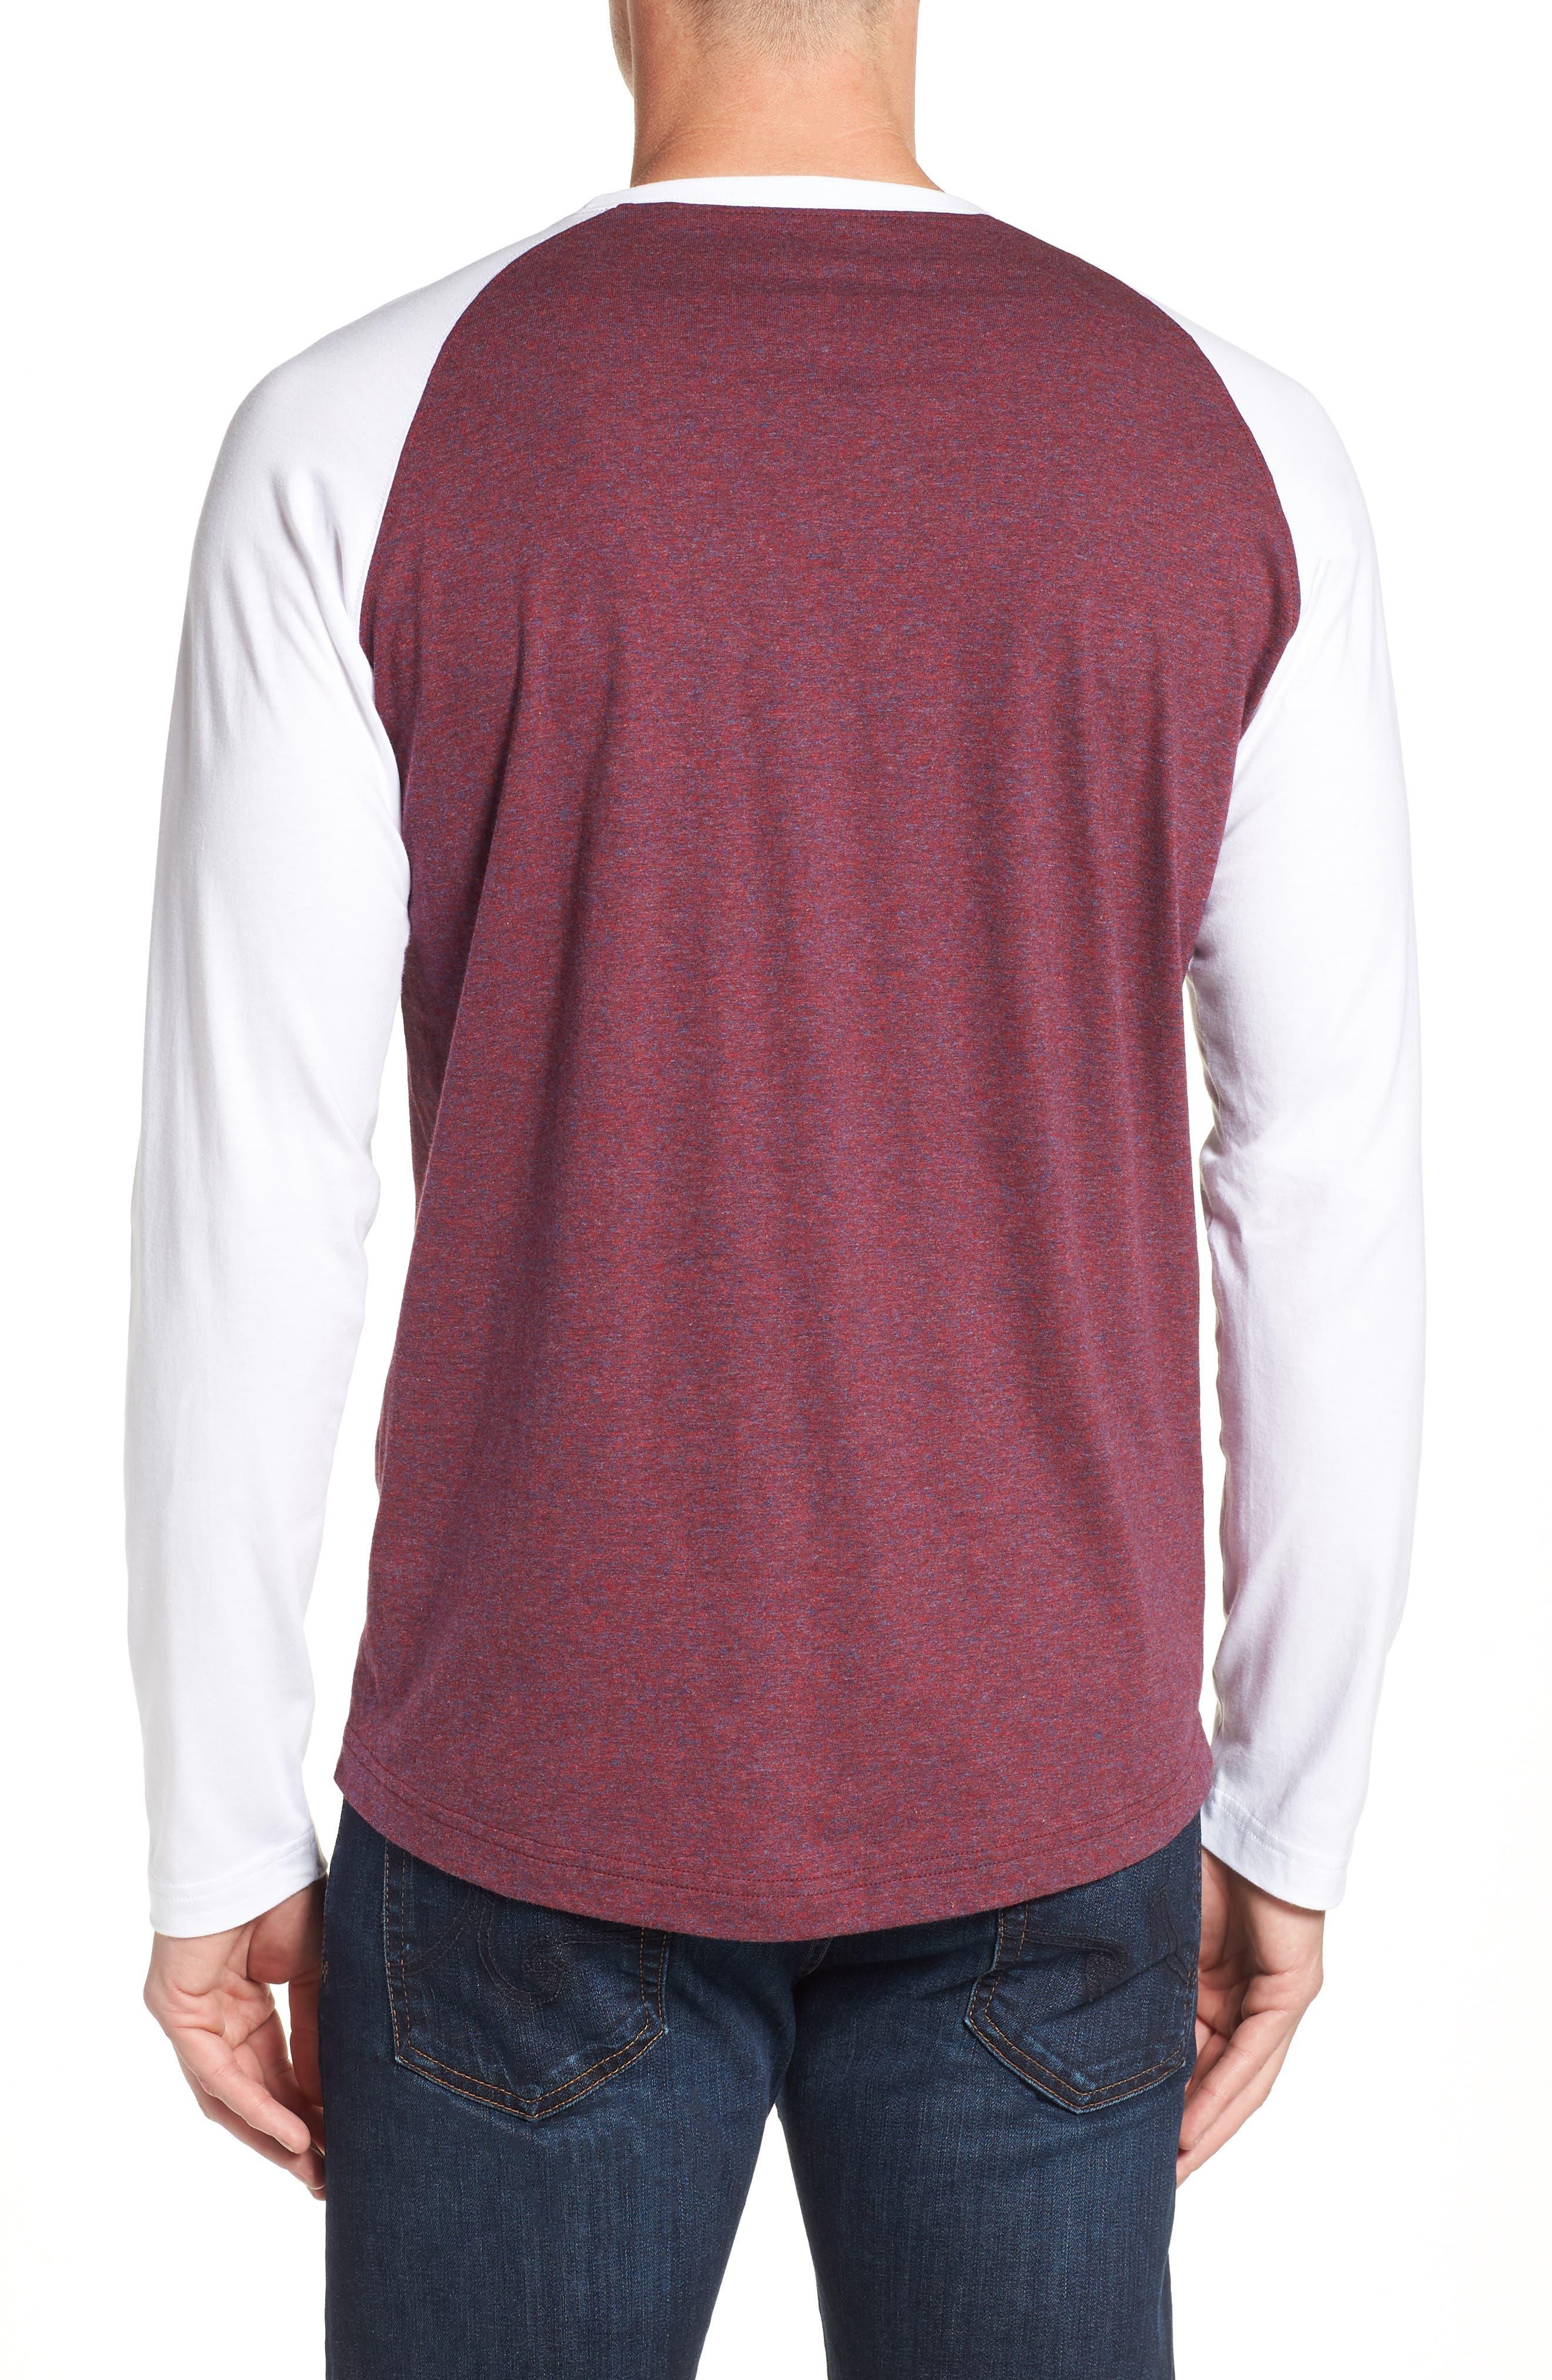 Cobb Raglan T-Shirt,                             Alternate thumbnail 2, color,                             BURGUNDY SALT PEPPER